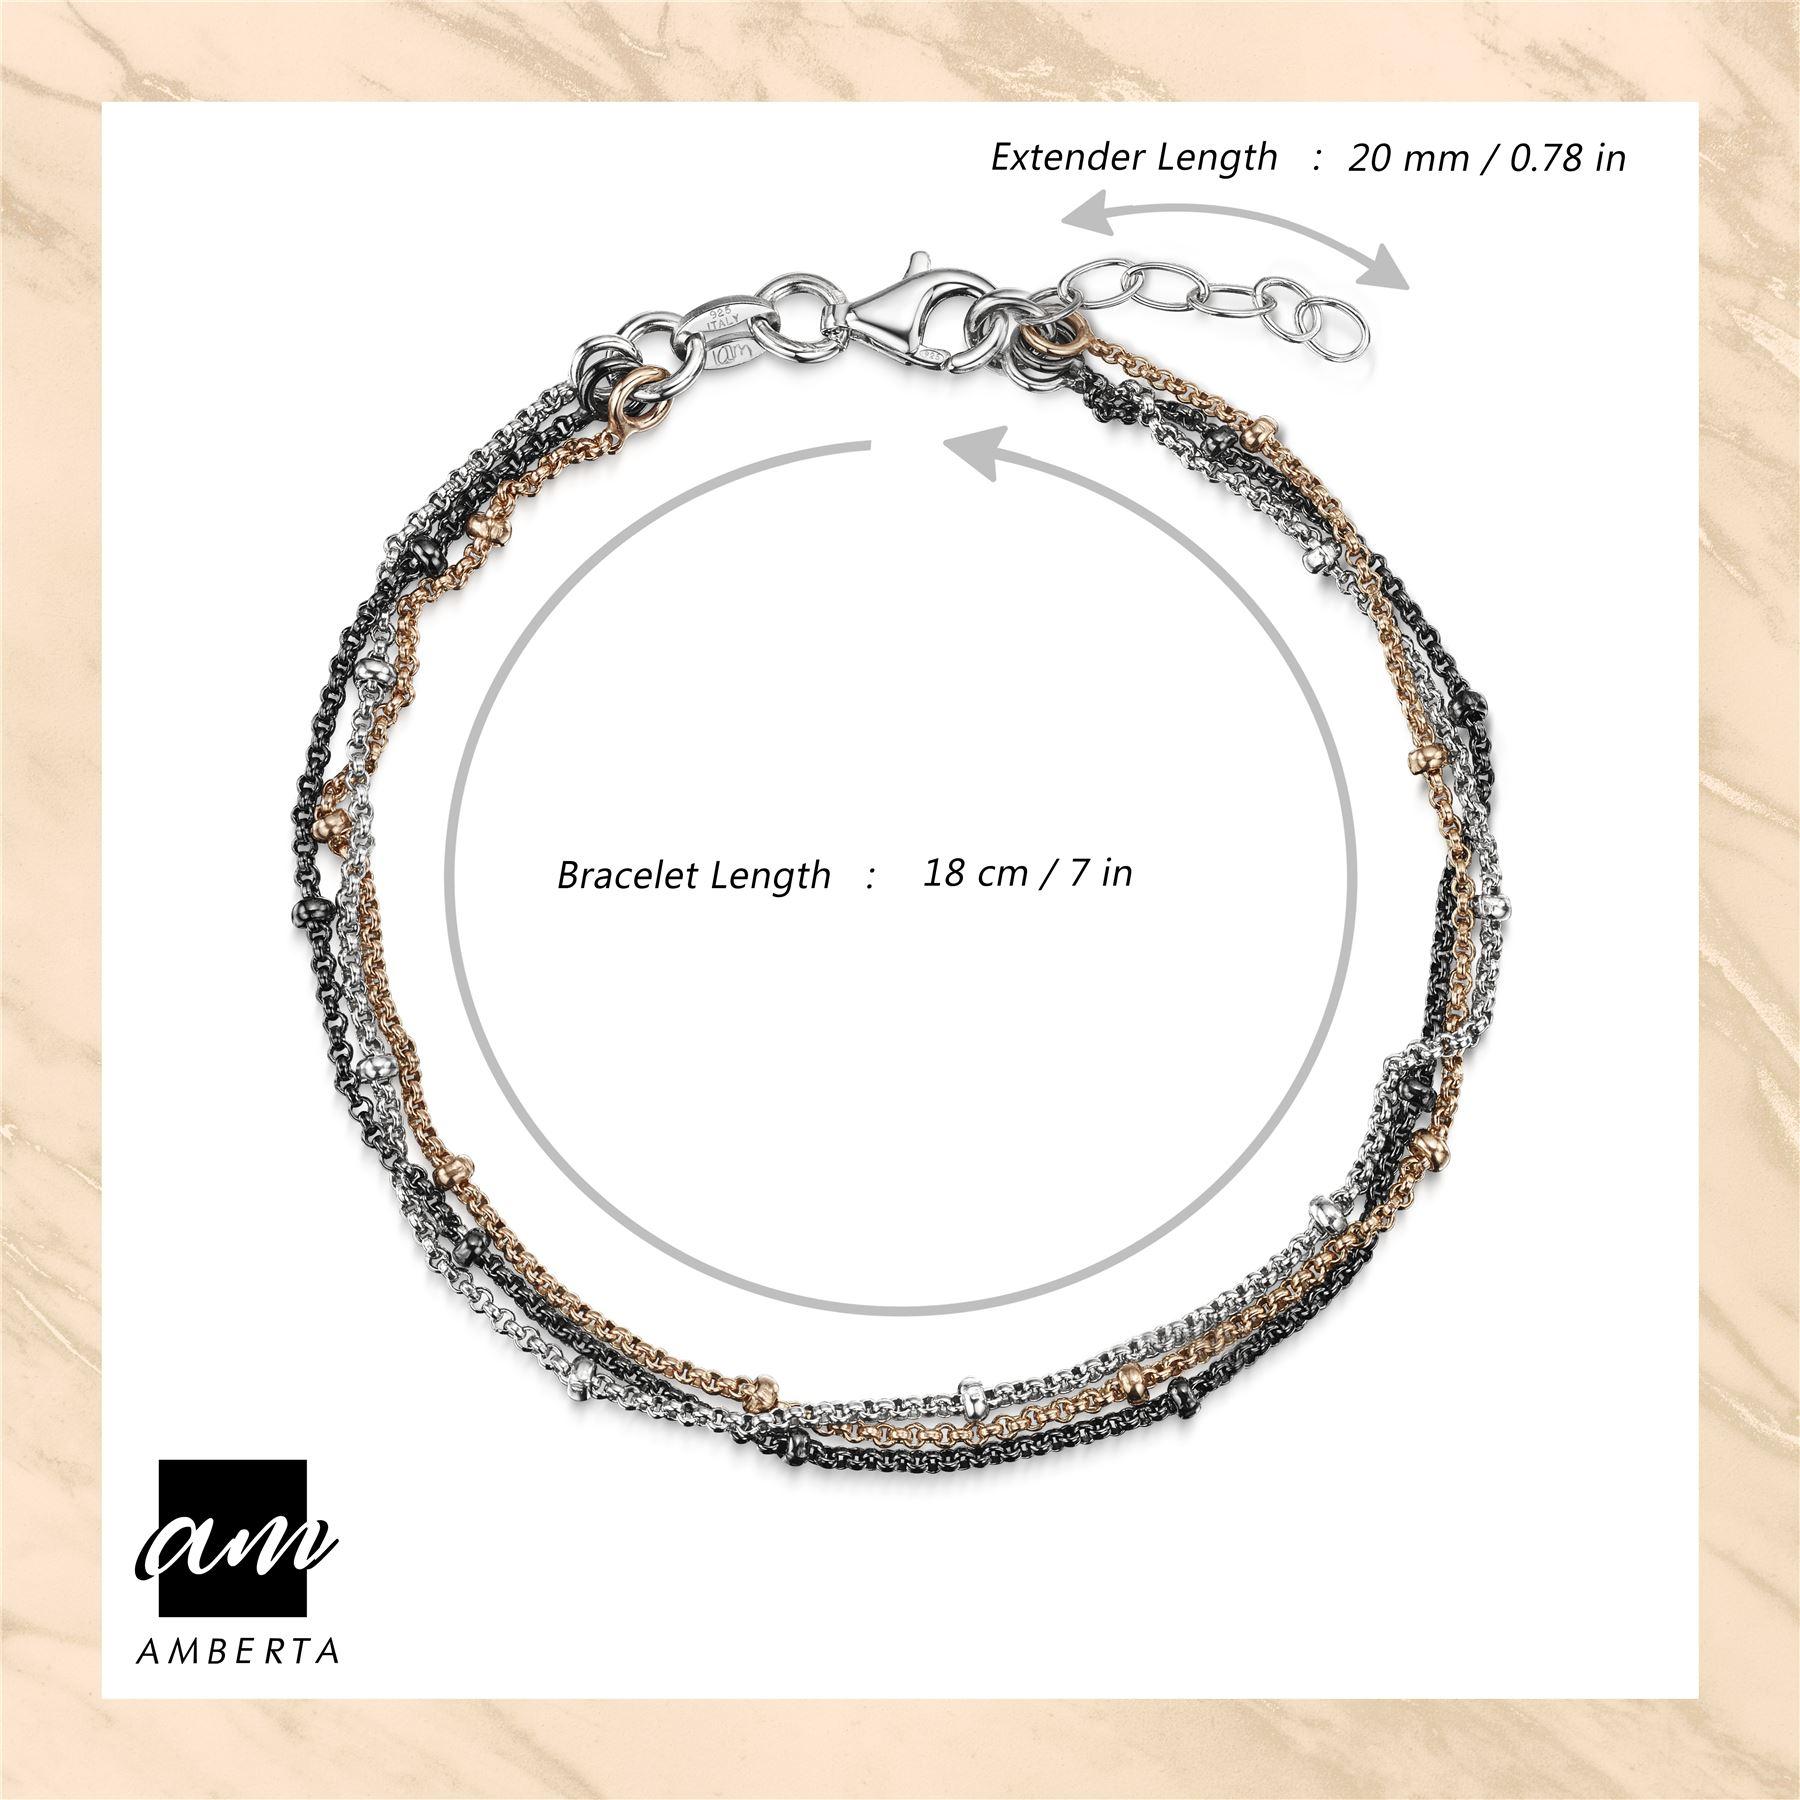 Amberta-925-Sterling-Silver-Adjustable-Multi-Layered-Chain-Bracelet-for-Women miniature 13